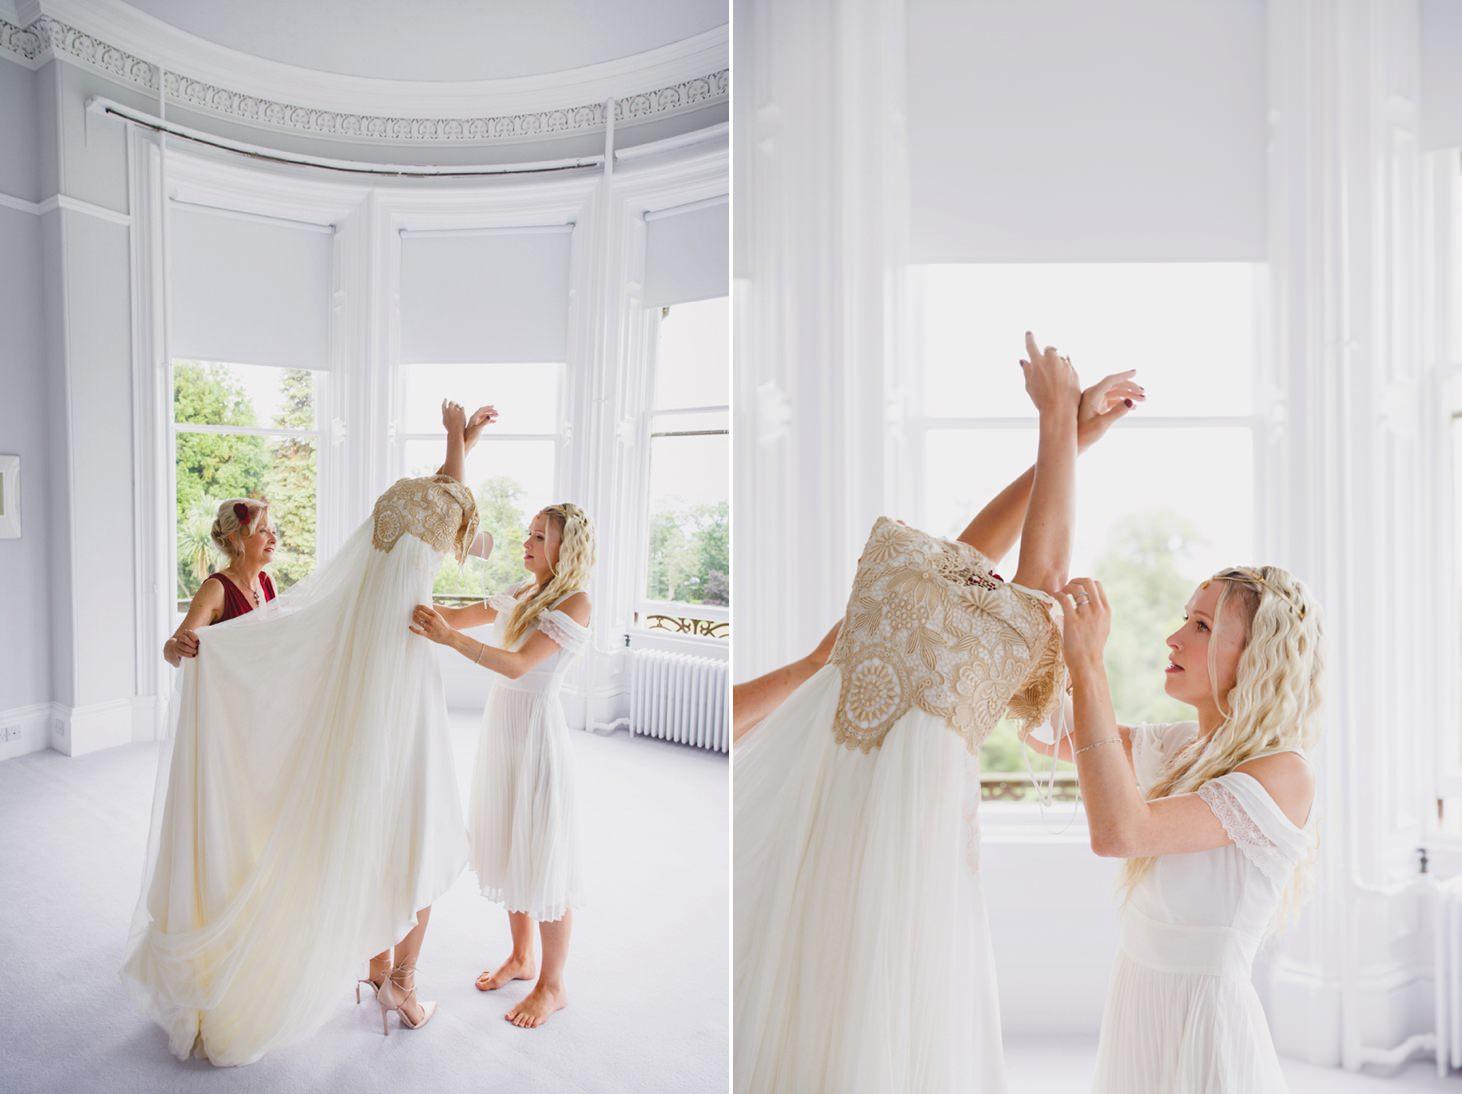 mount stuart wedding photography bride pulling on dress